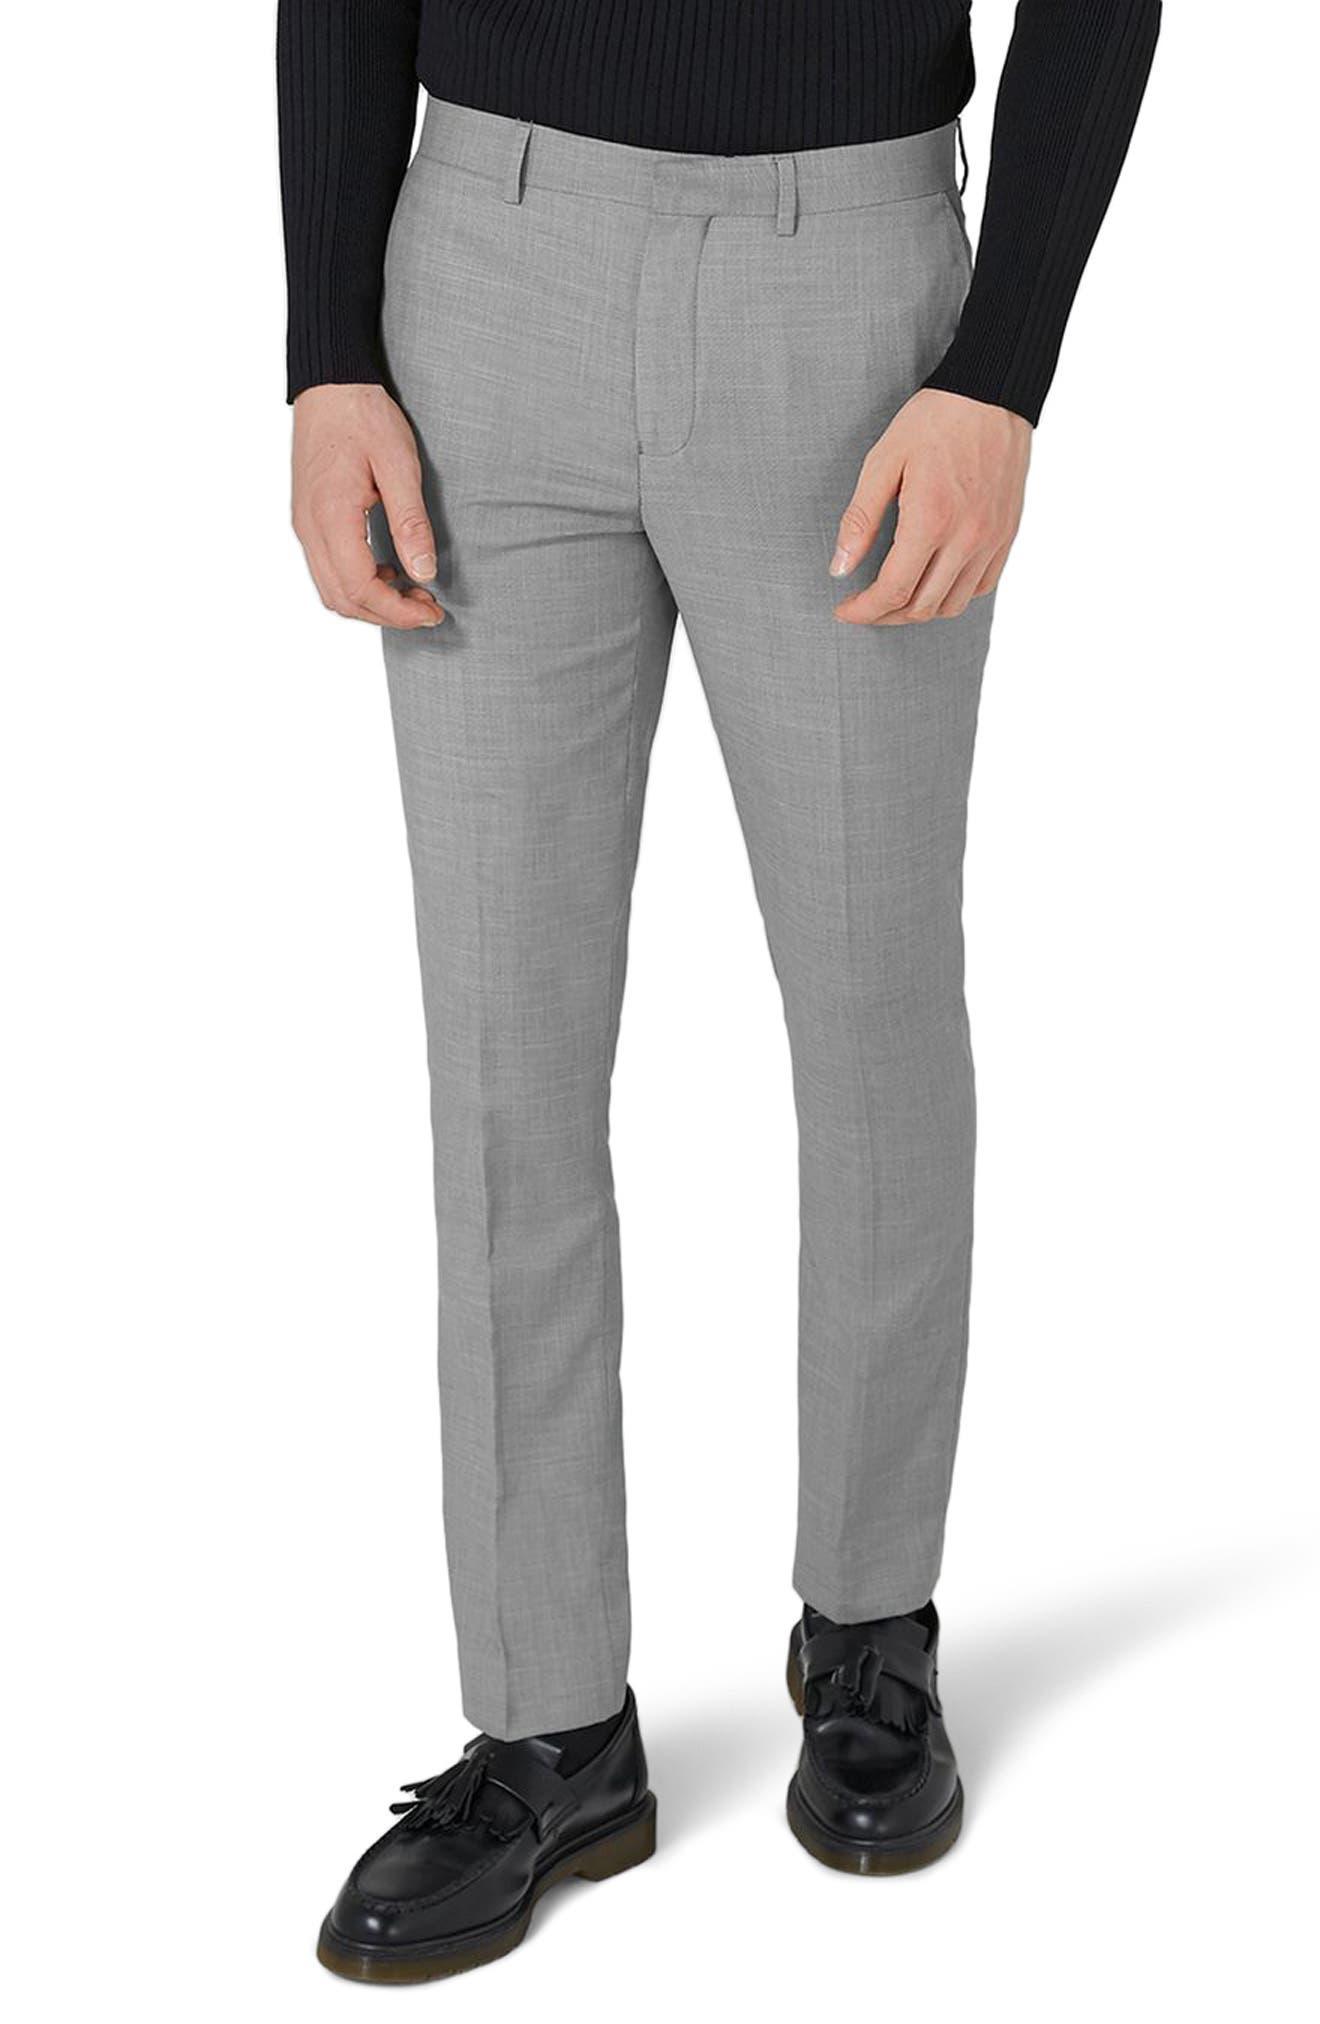 Men's Topman Como Skinny Fit Grey Suit Pants